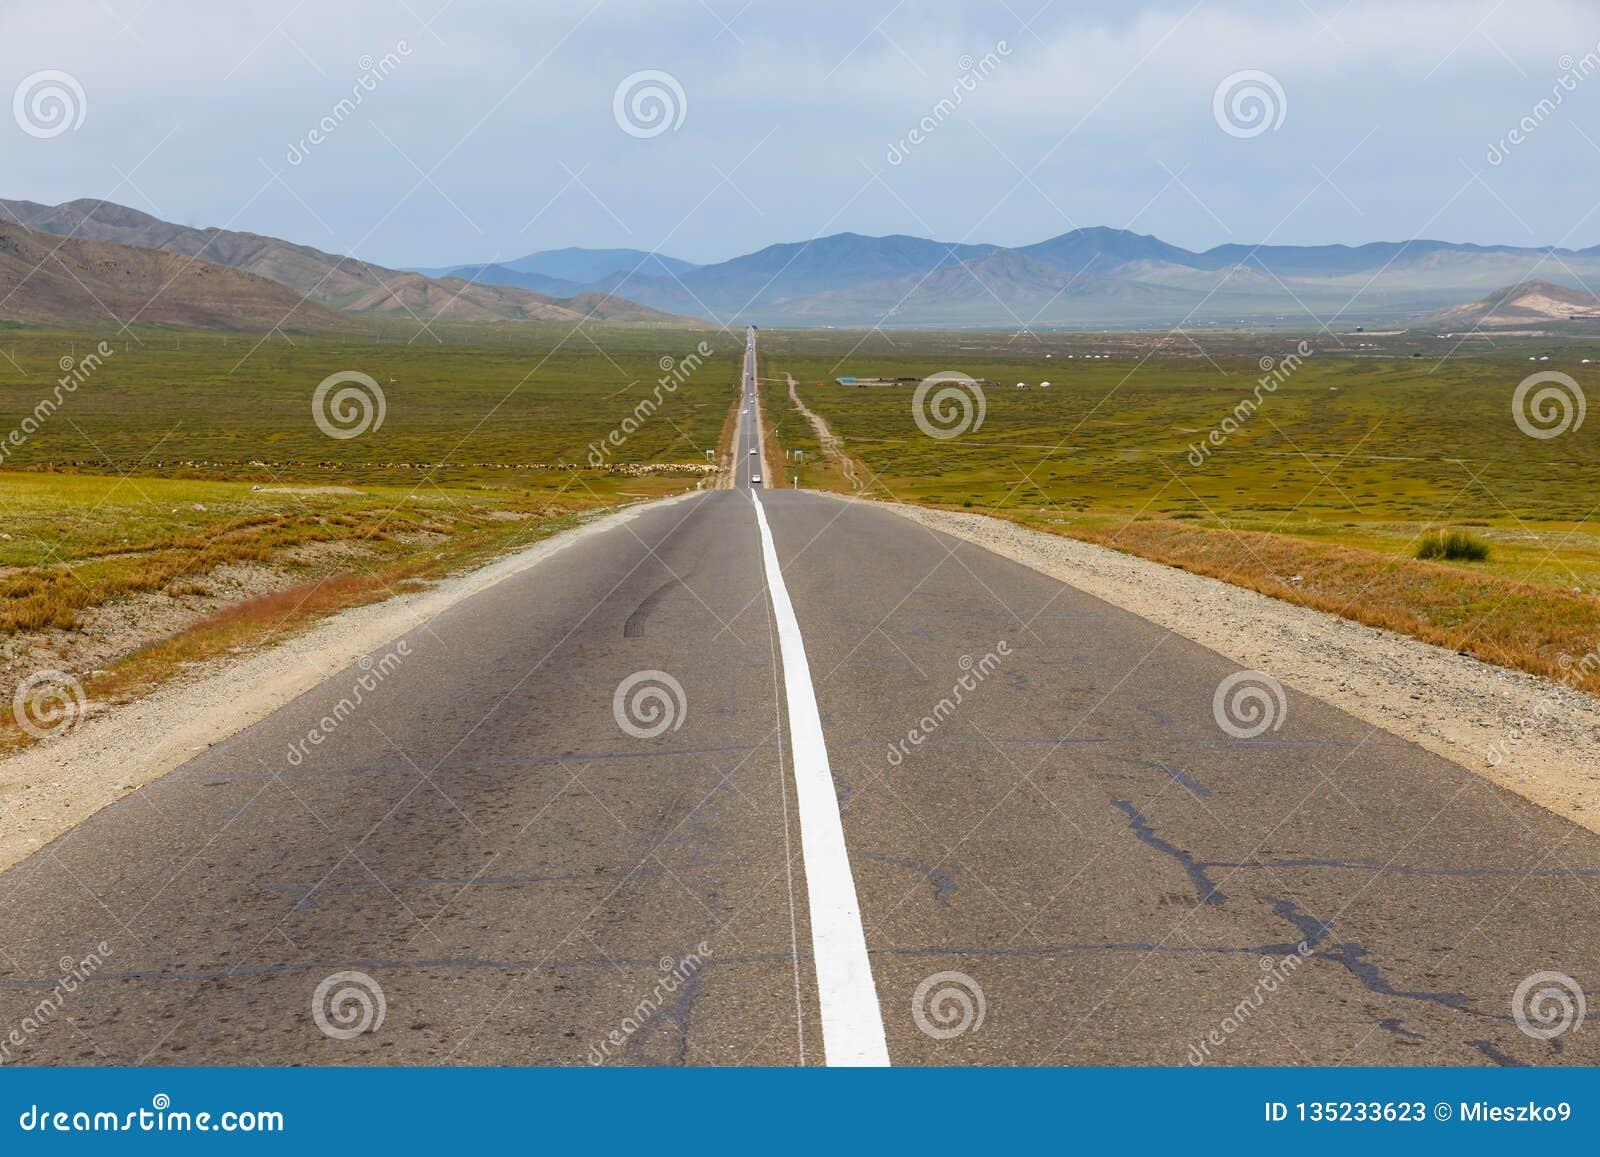 Asphalt road Sukhe Bator - Darkhan in Mongolia